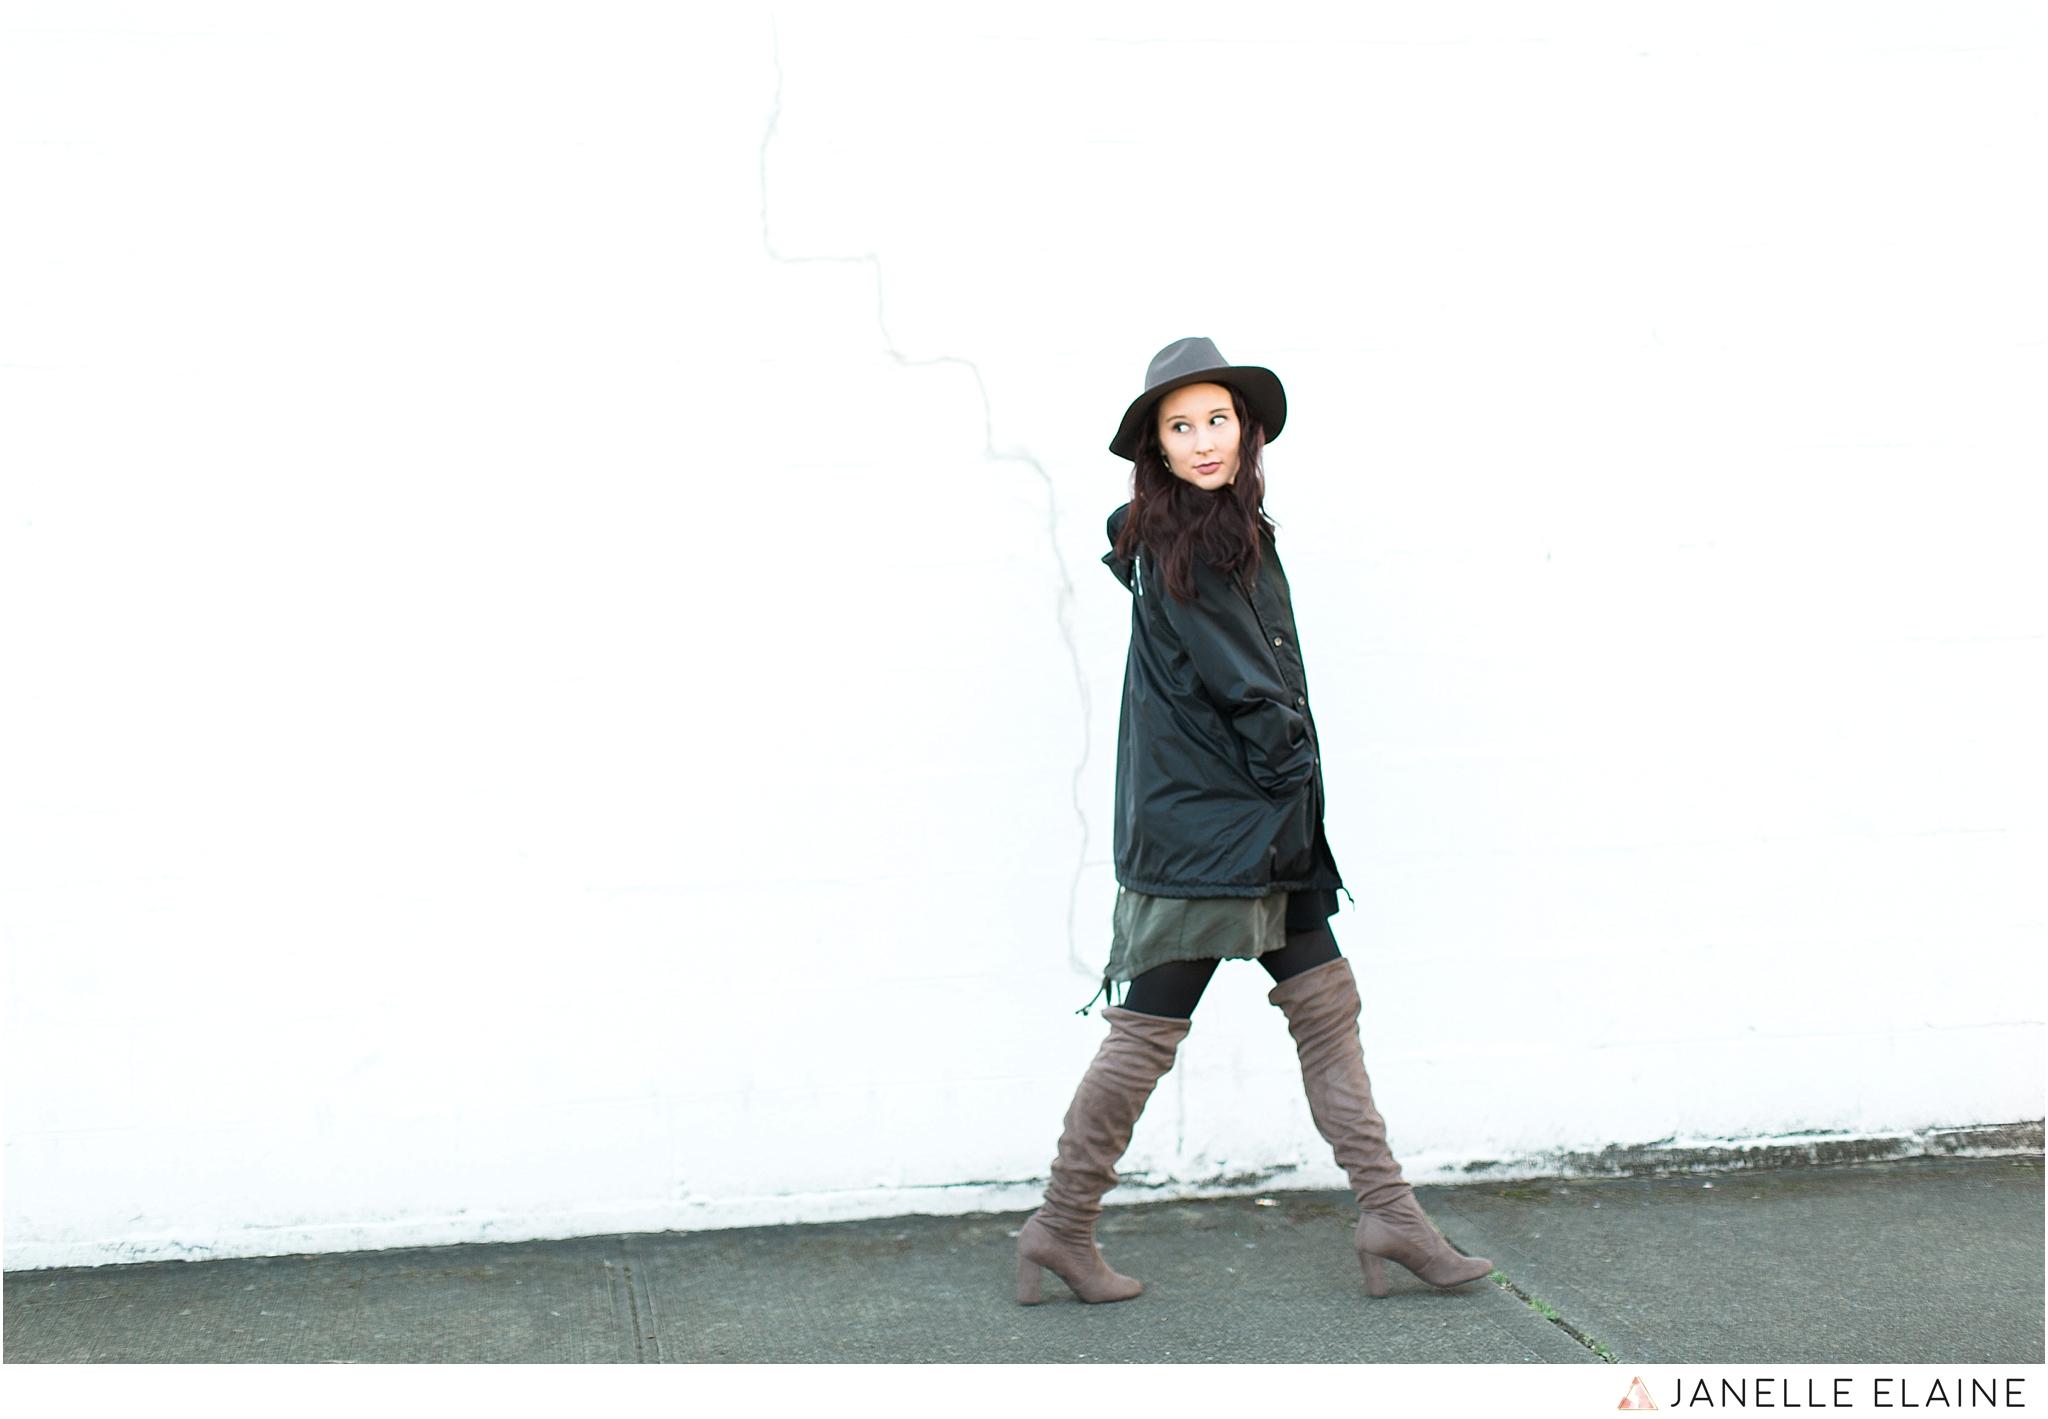 janelle elaine photography-seattle portrait photographer-washington-Hannah-42.jpg